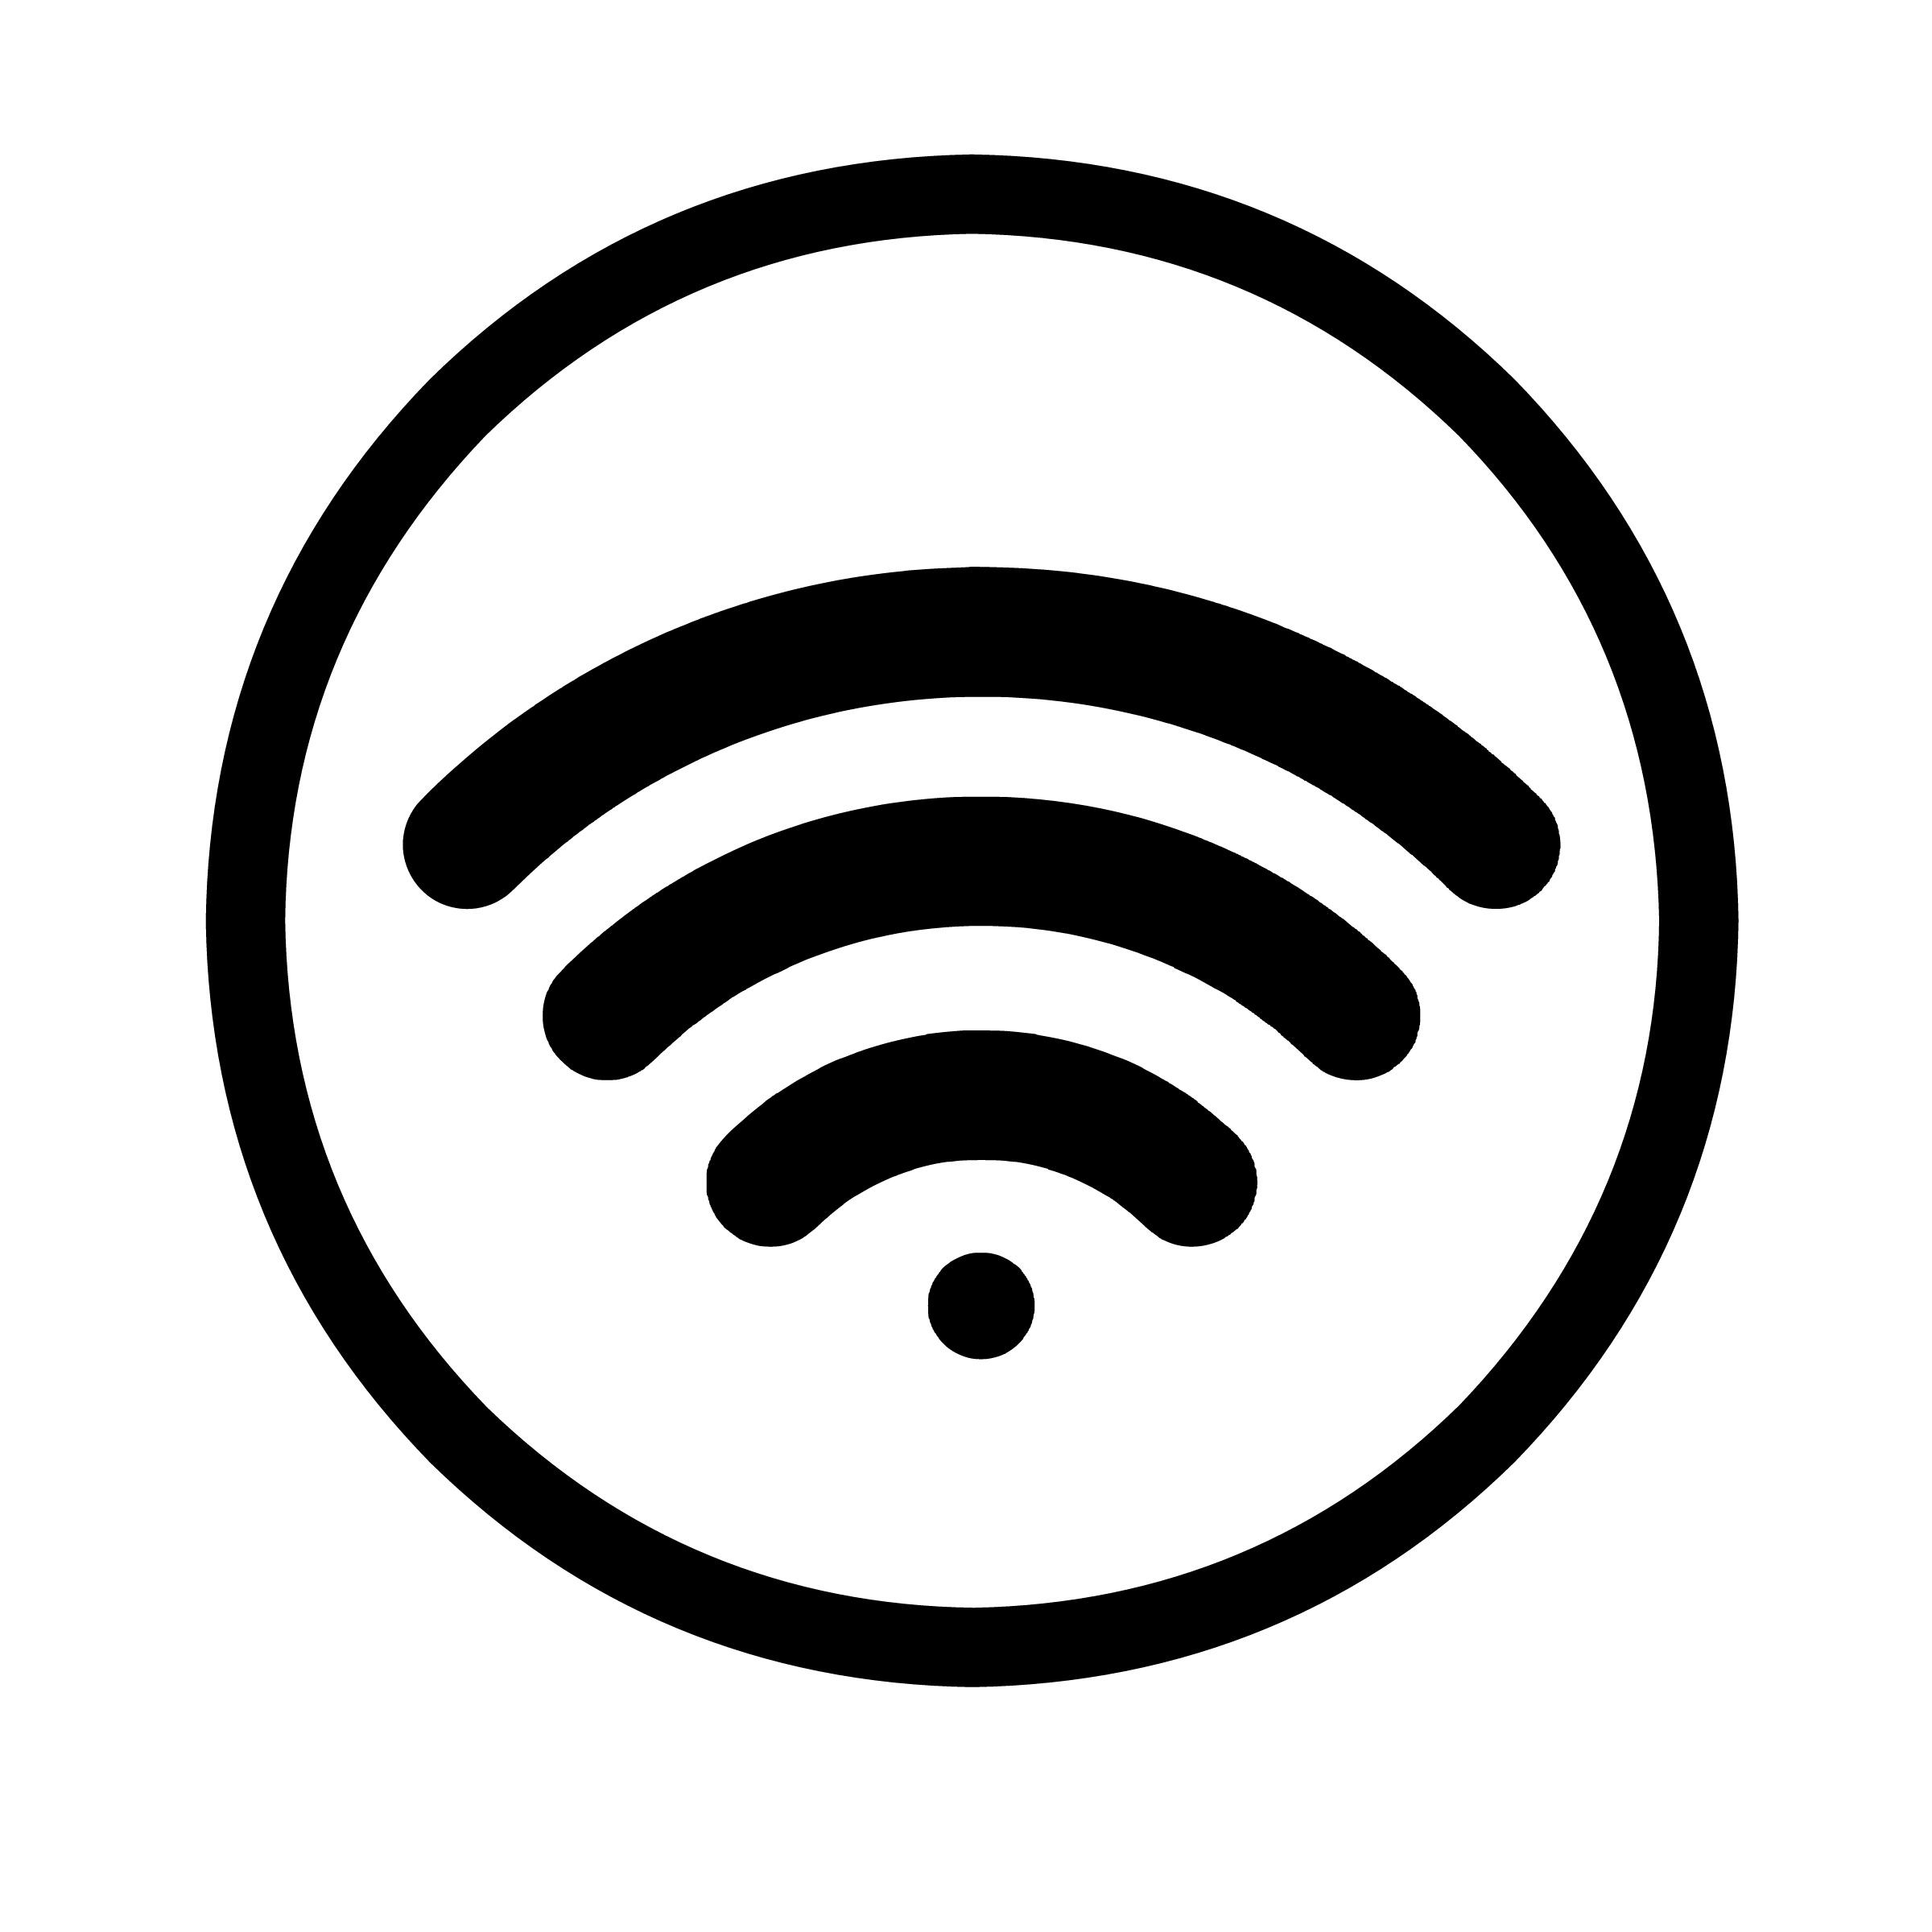 Folkekære Bildet : trådløst, forbindelse, wifi, signal, ikon, internett EB-74